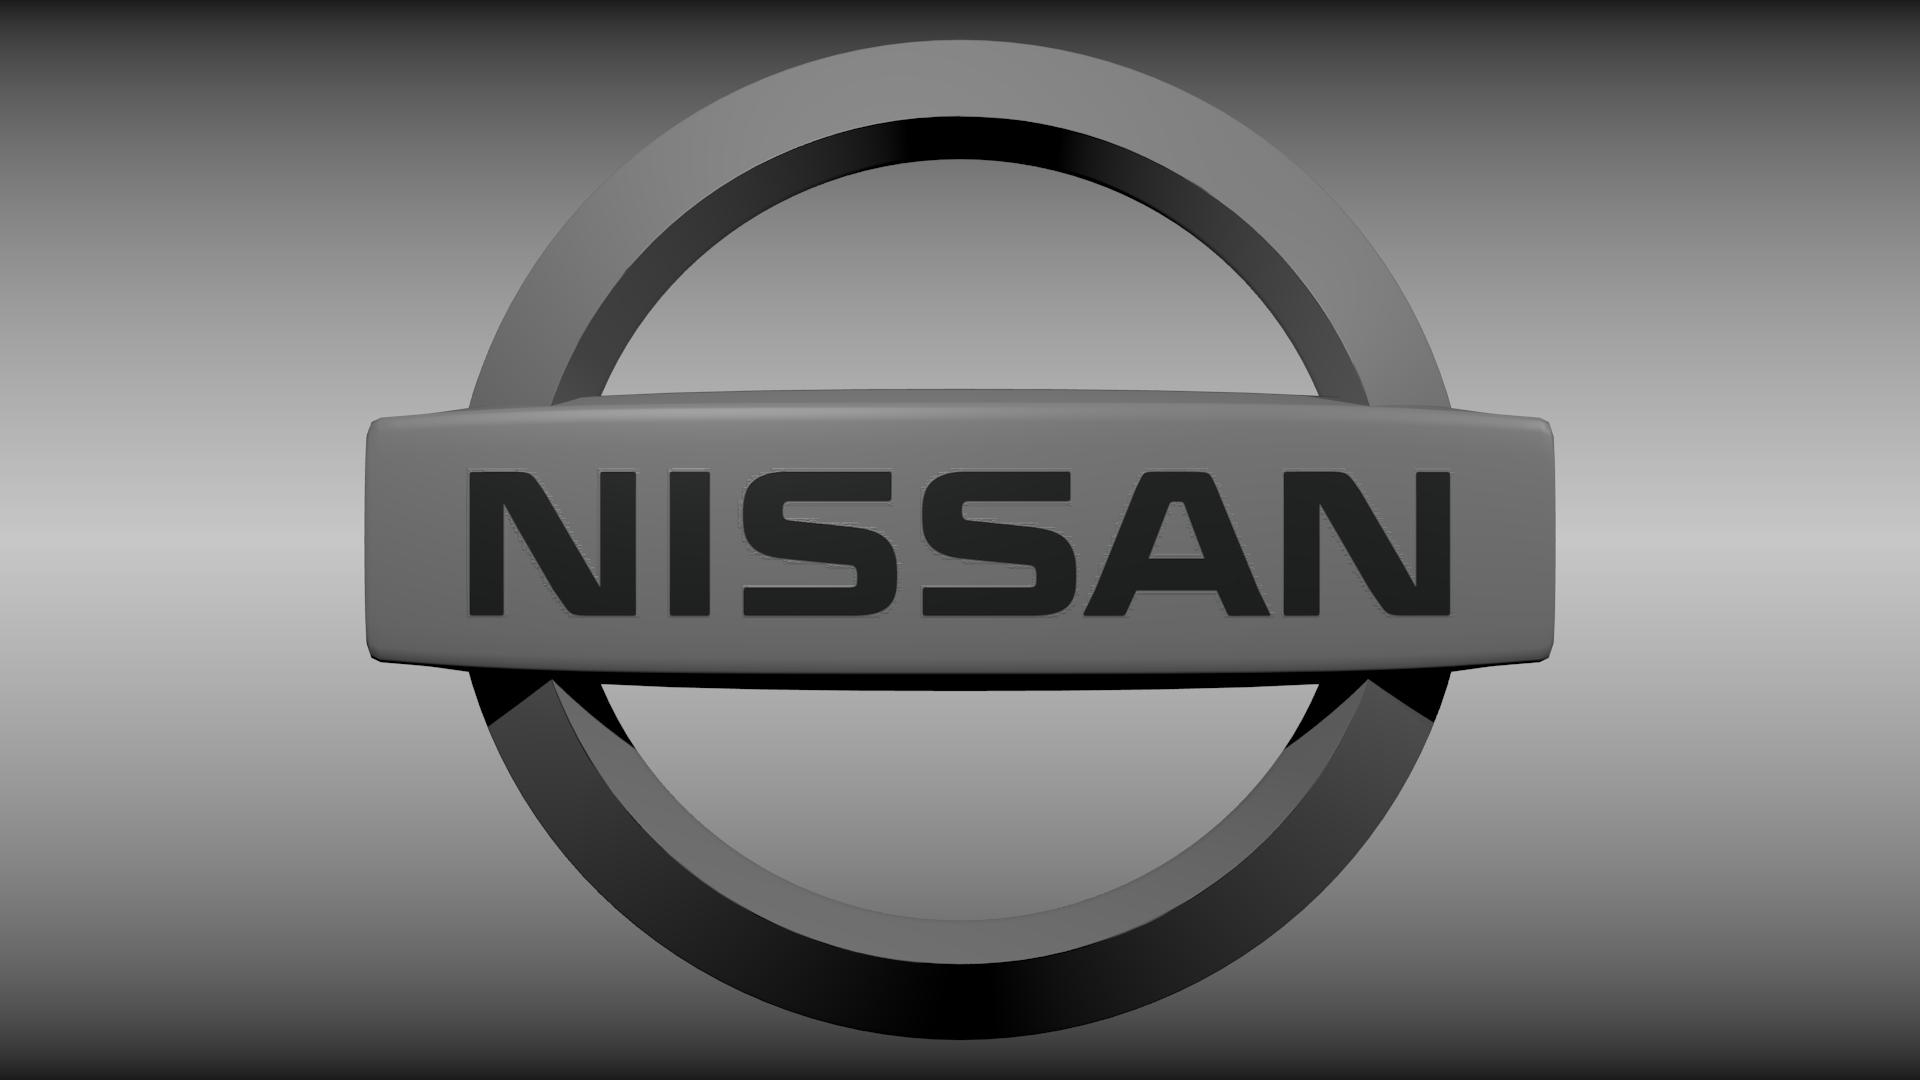 5 HD Nissan Logo Wallpapers